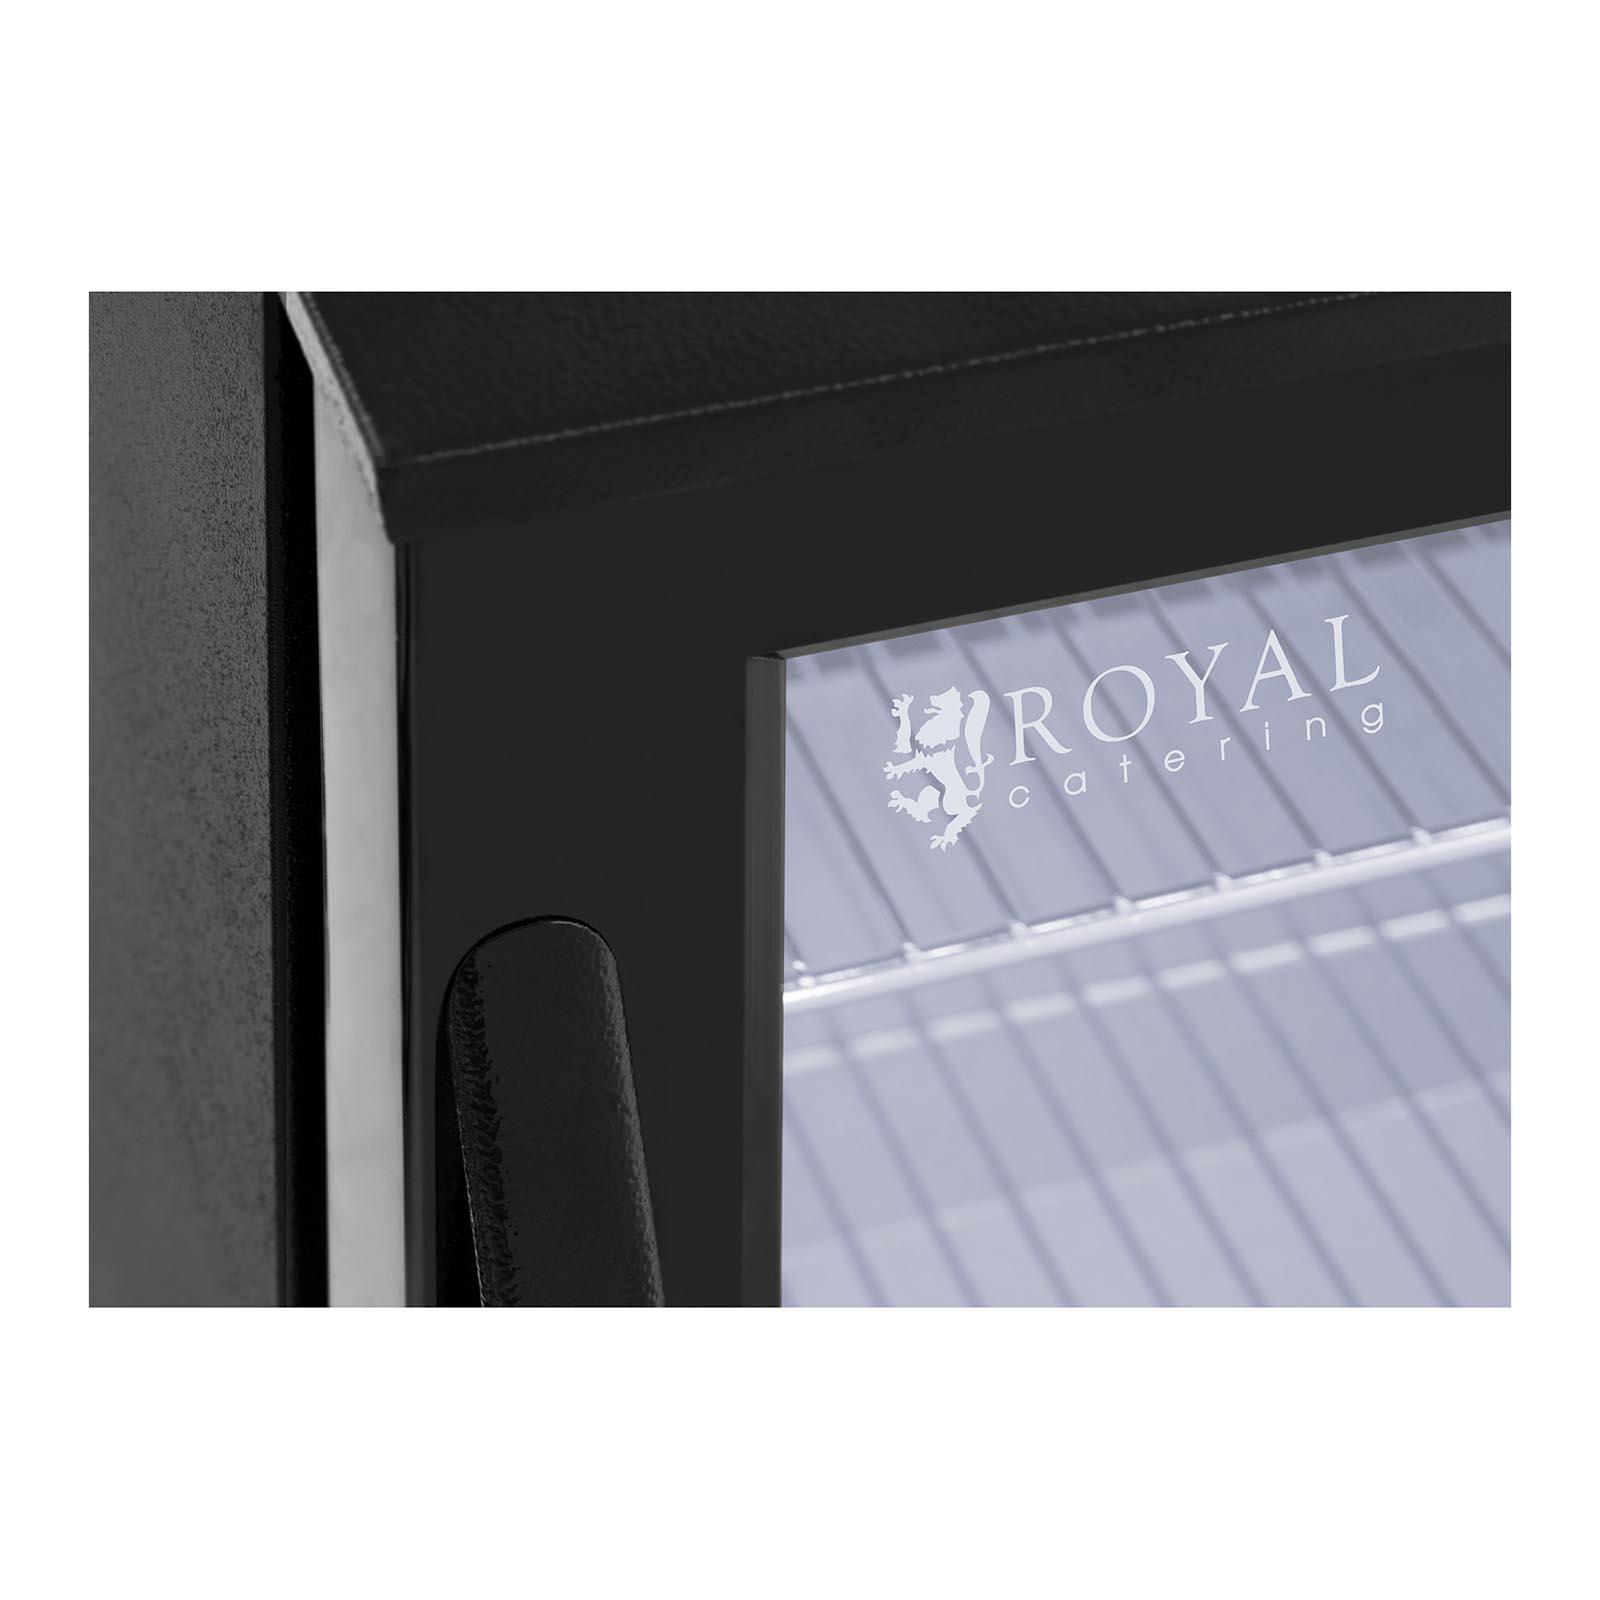 minibar k hlschrank getr nkek hlschrank flaschenk hlschrank glast r 138l schwarz ebay. Black Bedroom Furniture Sets. Home Design Ideas